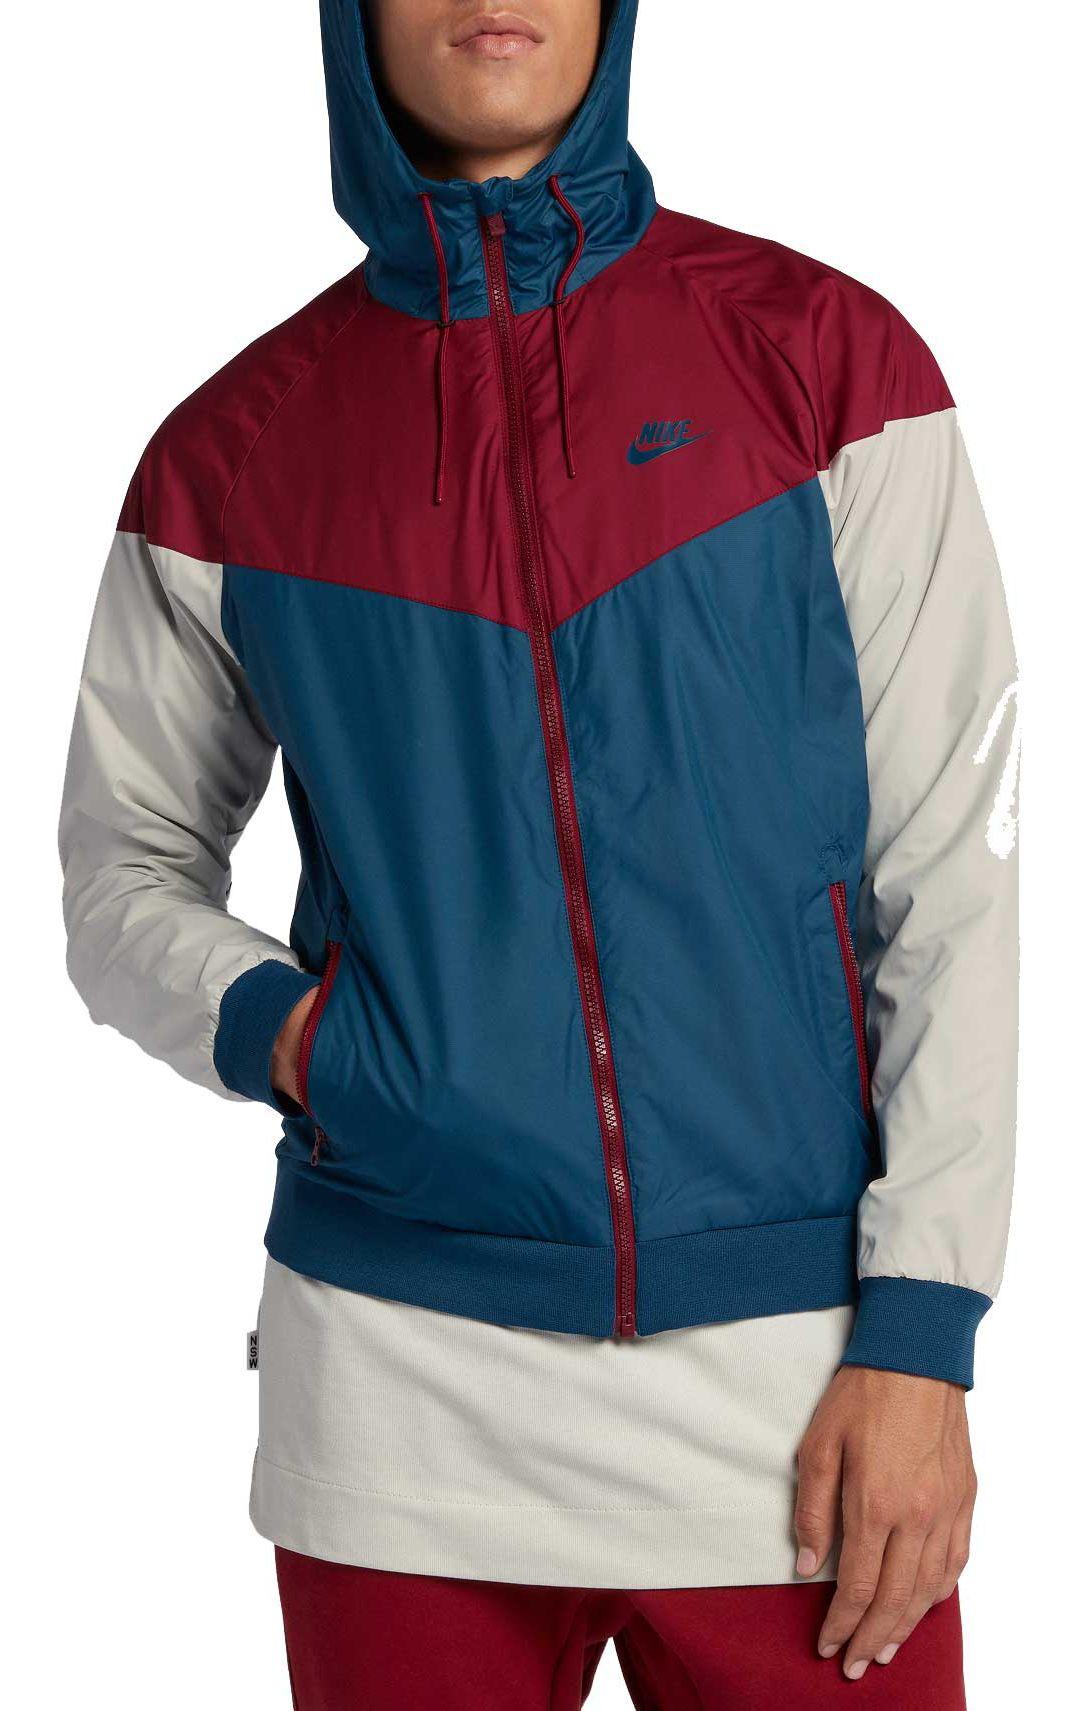 9488316ad030d Nike Men's Windrunner Full Zip Jacket. noImageFound. Previous